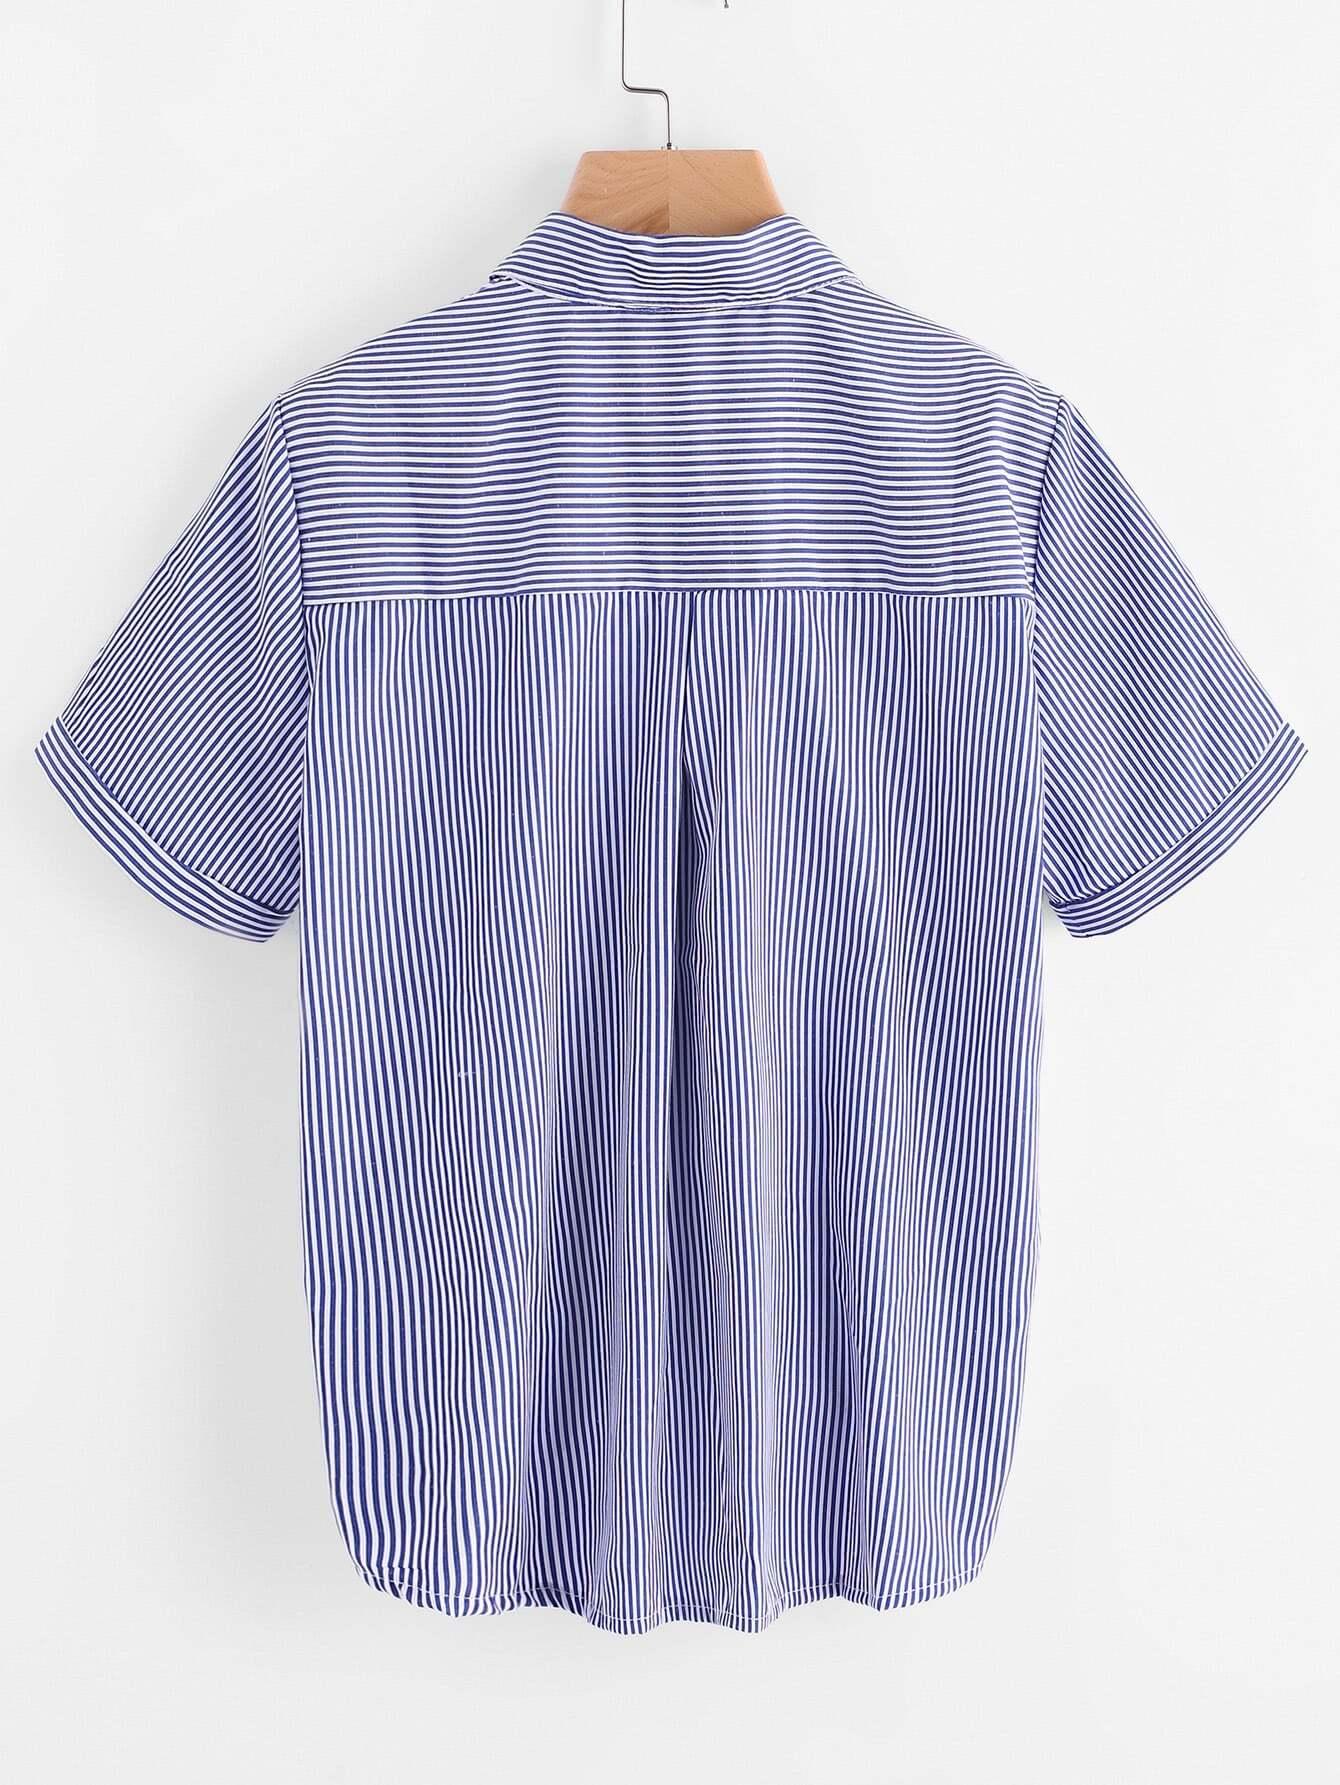 Embroidery Tie Hem Striped Shirt Shein Sheinside